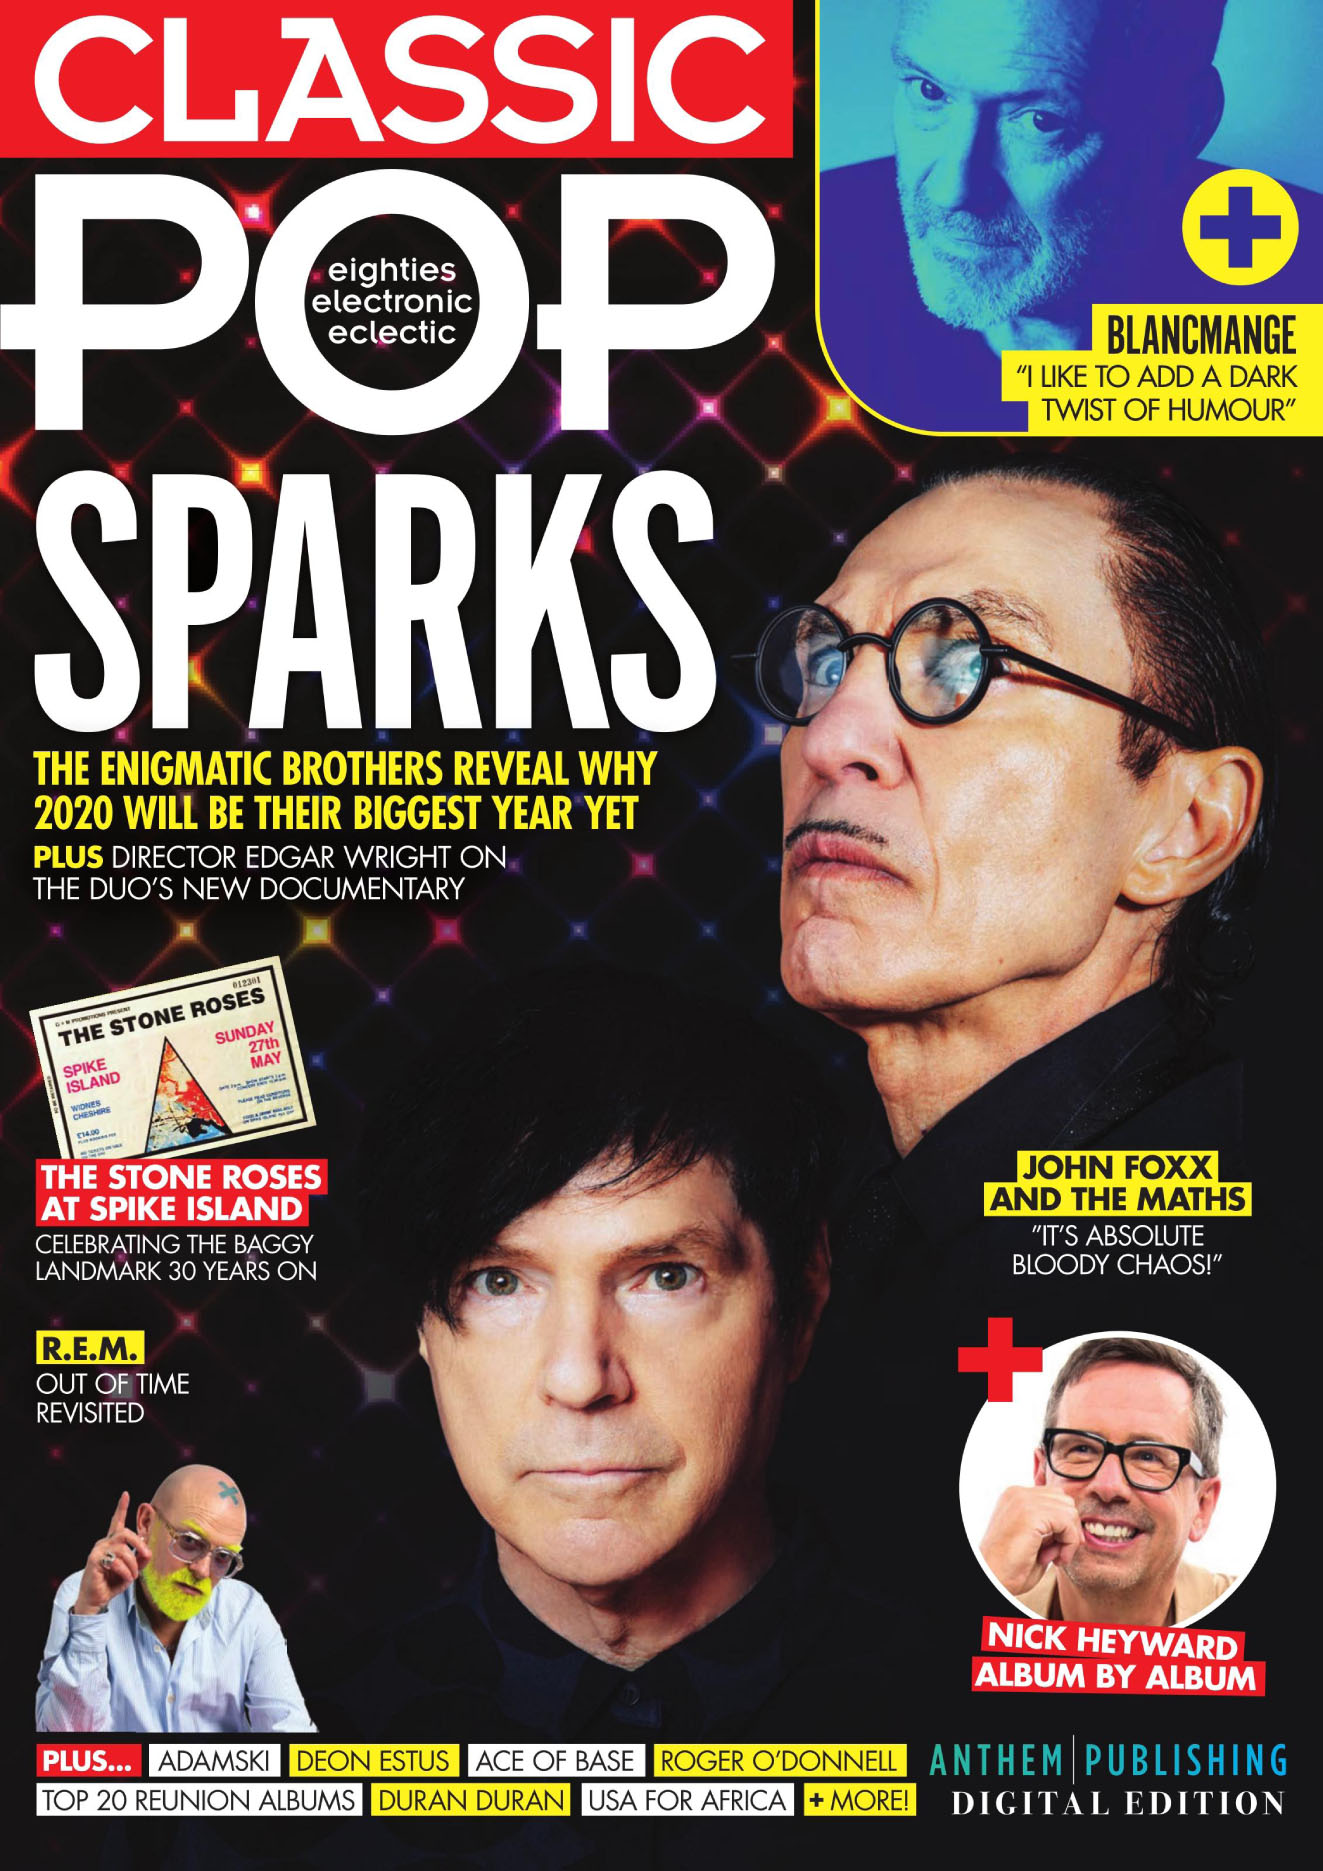 Classic Pop 2020-07-08 Sparks 01.jpg